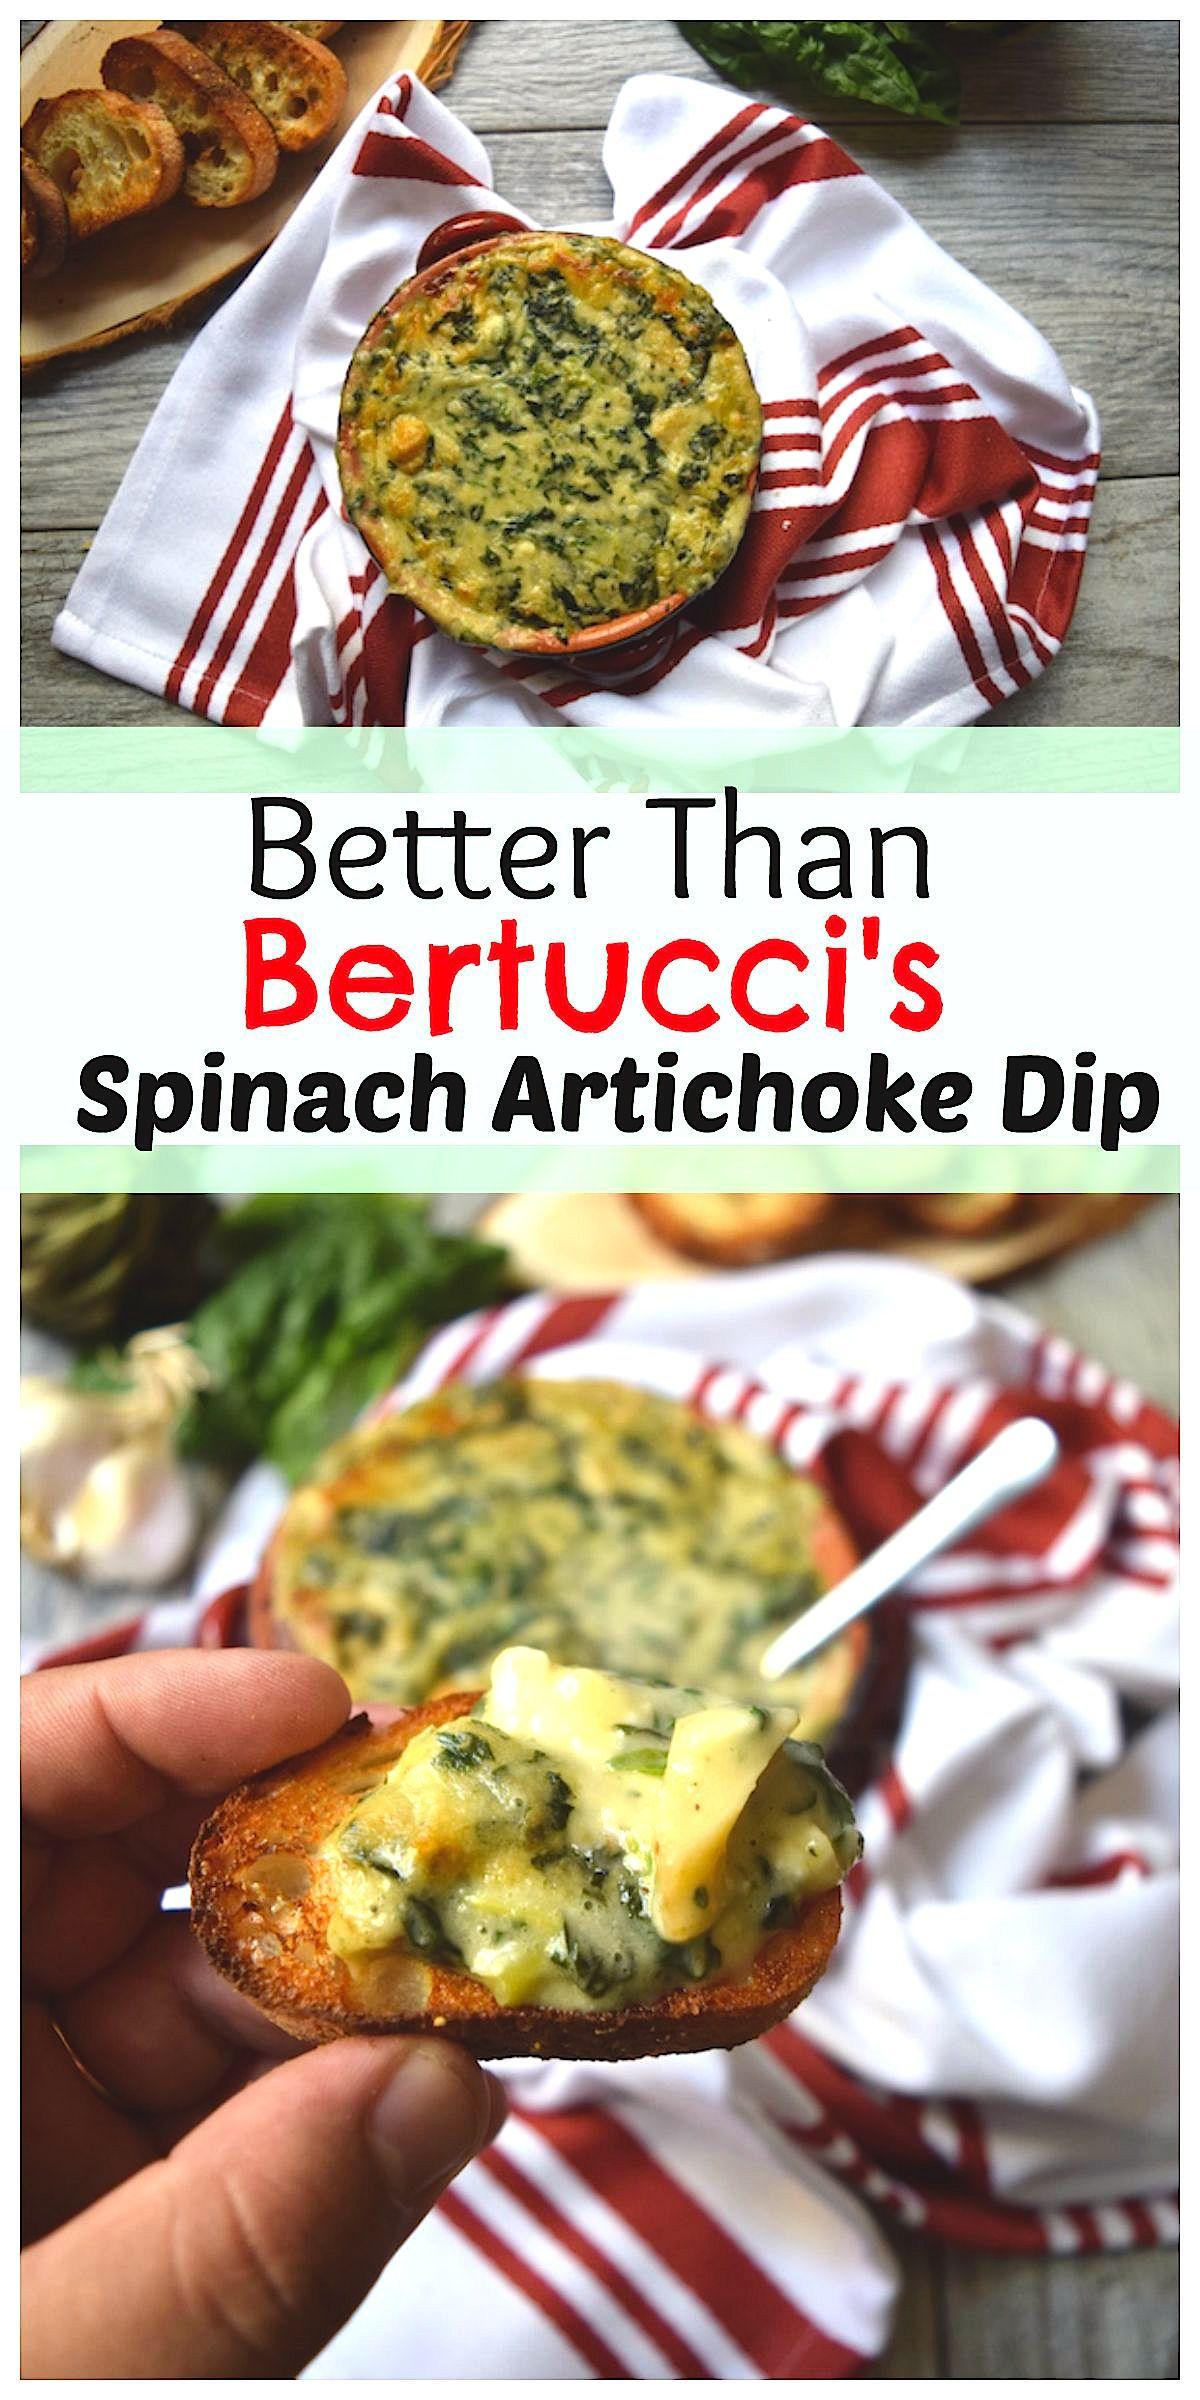 Better than bertuccis spinach artichoke dip recipe